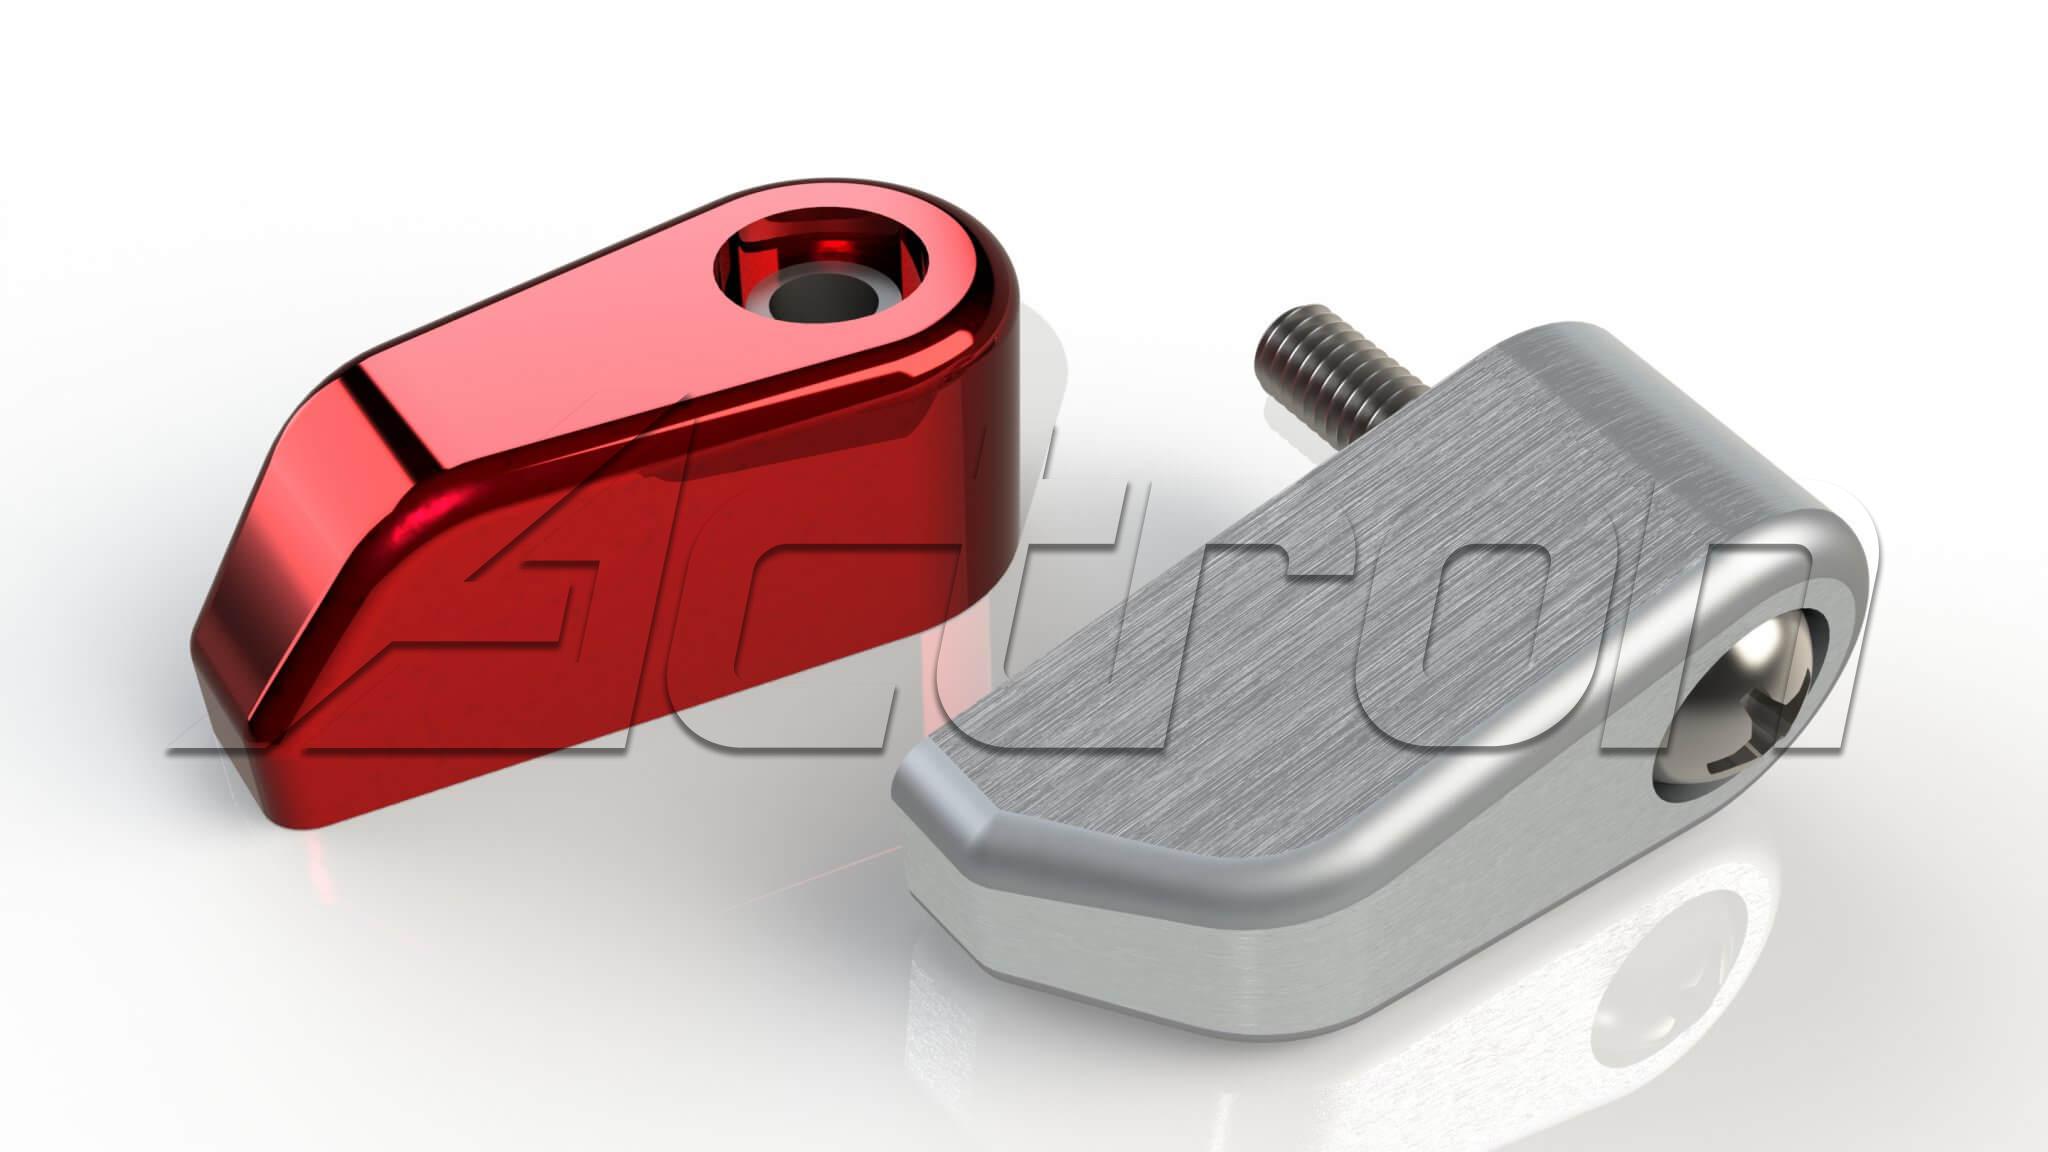 1-4-turn-retainer-4729-a35501.jpg